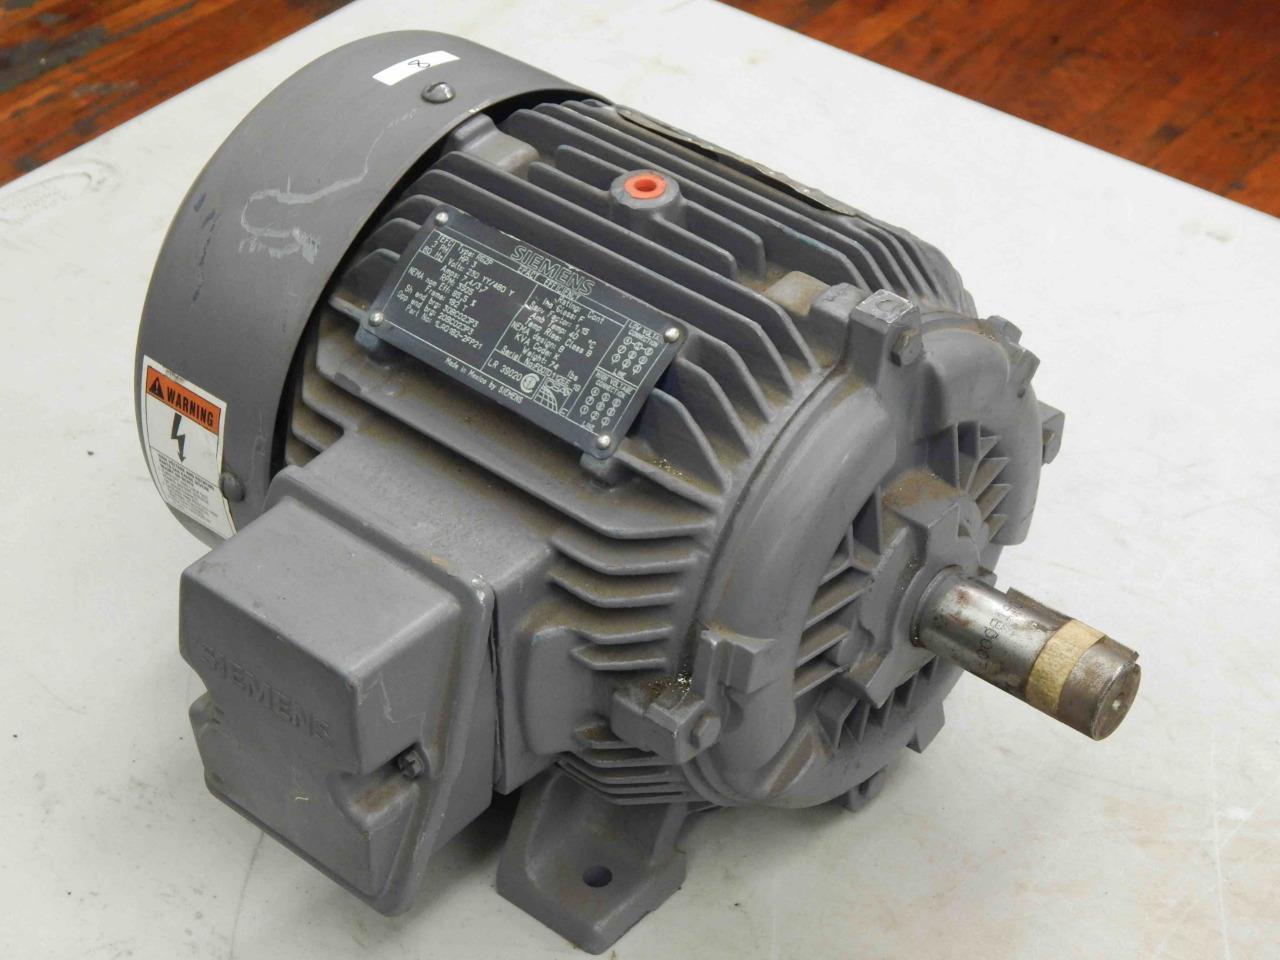 #8 Siemens Motor 1LA0182-2FP21 RGZP TEFC 3-HP 230/460V ...